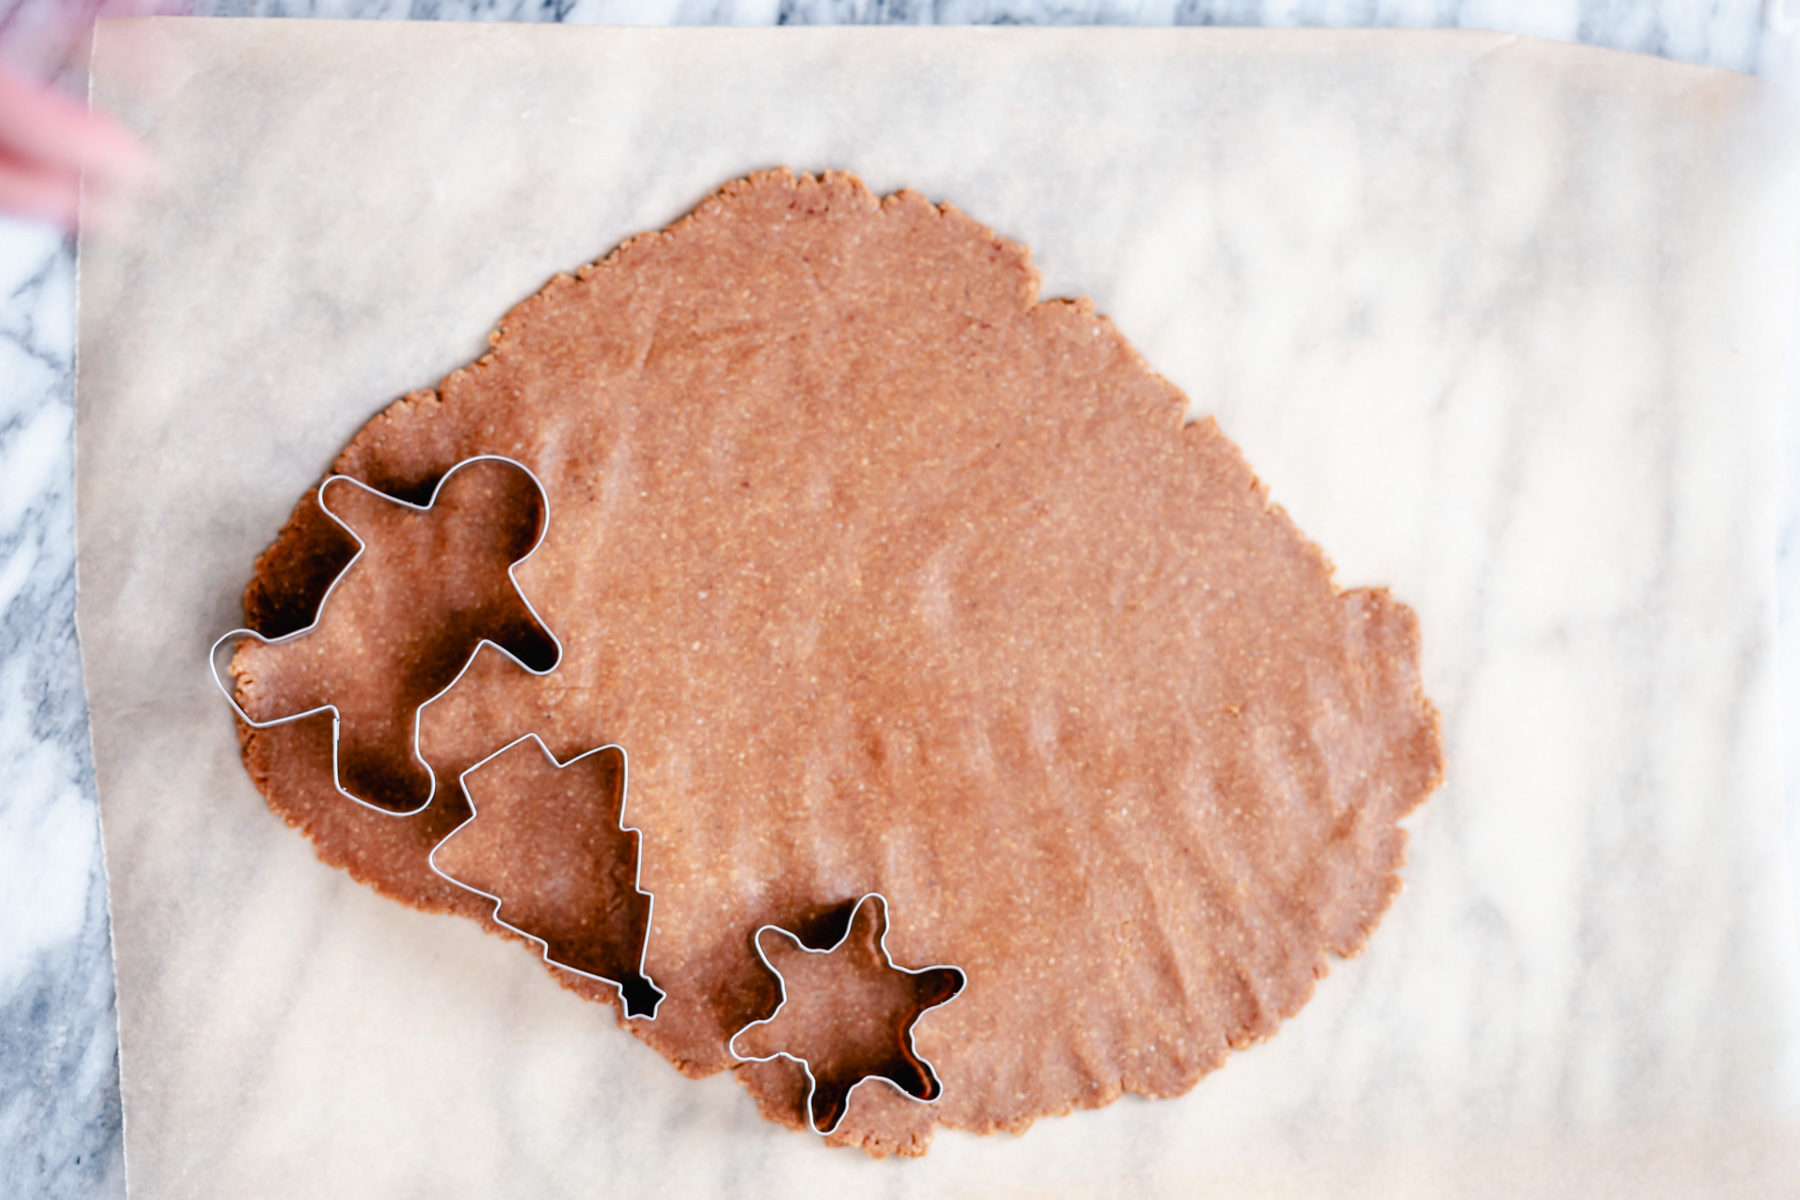 vegan gingerbread cookies being cut out